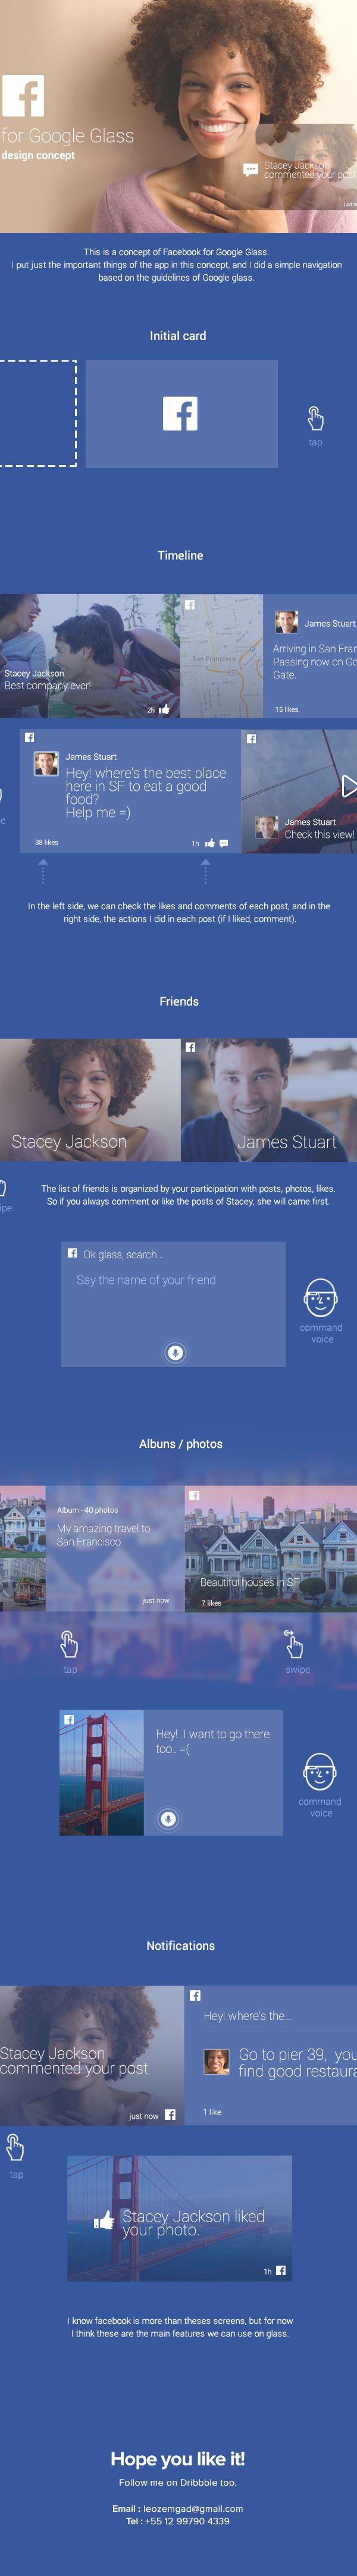 Facebook for Google Glass - Concept | Abduzeedo Design Inspiration